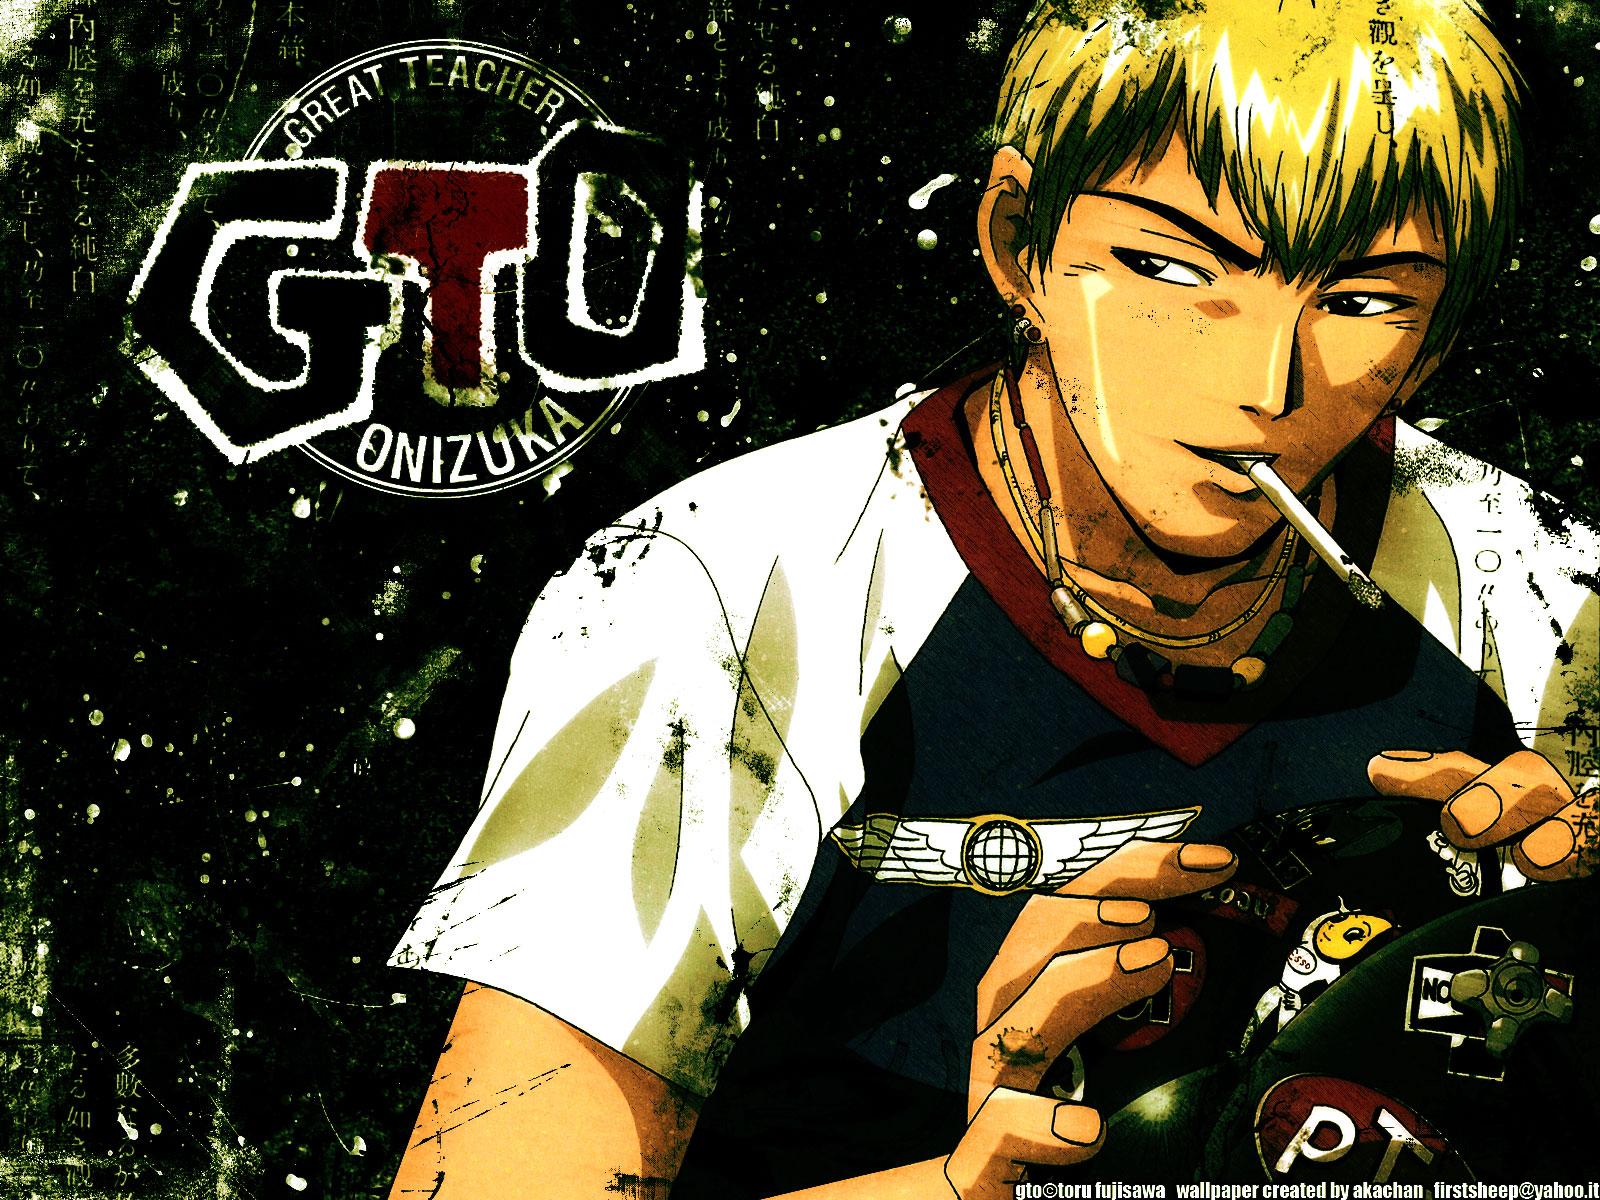 Great Teacher Onizuka Backgrounds, Compatible - PC, Mobile, Gadgets| 1600x1200 px